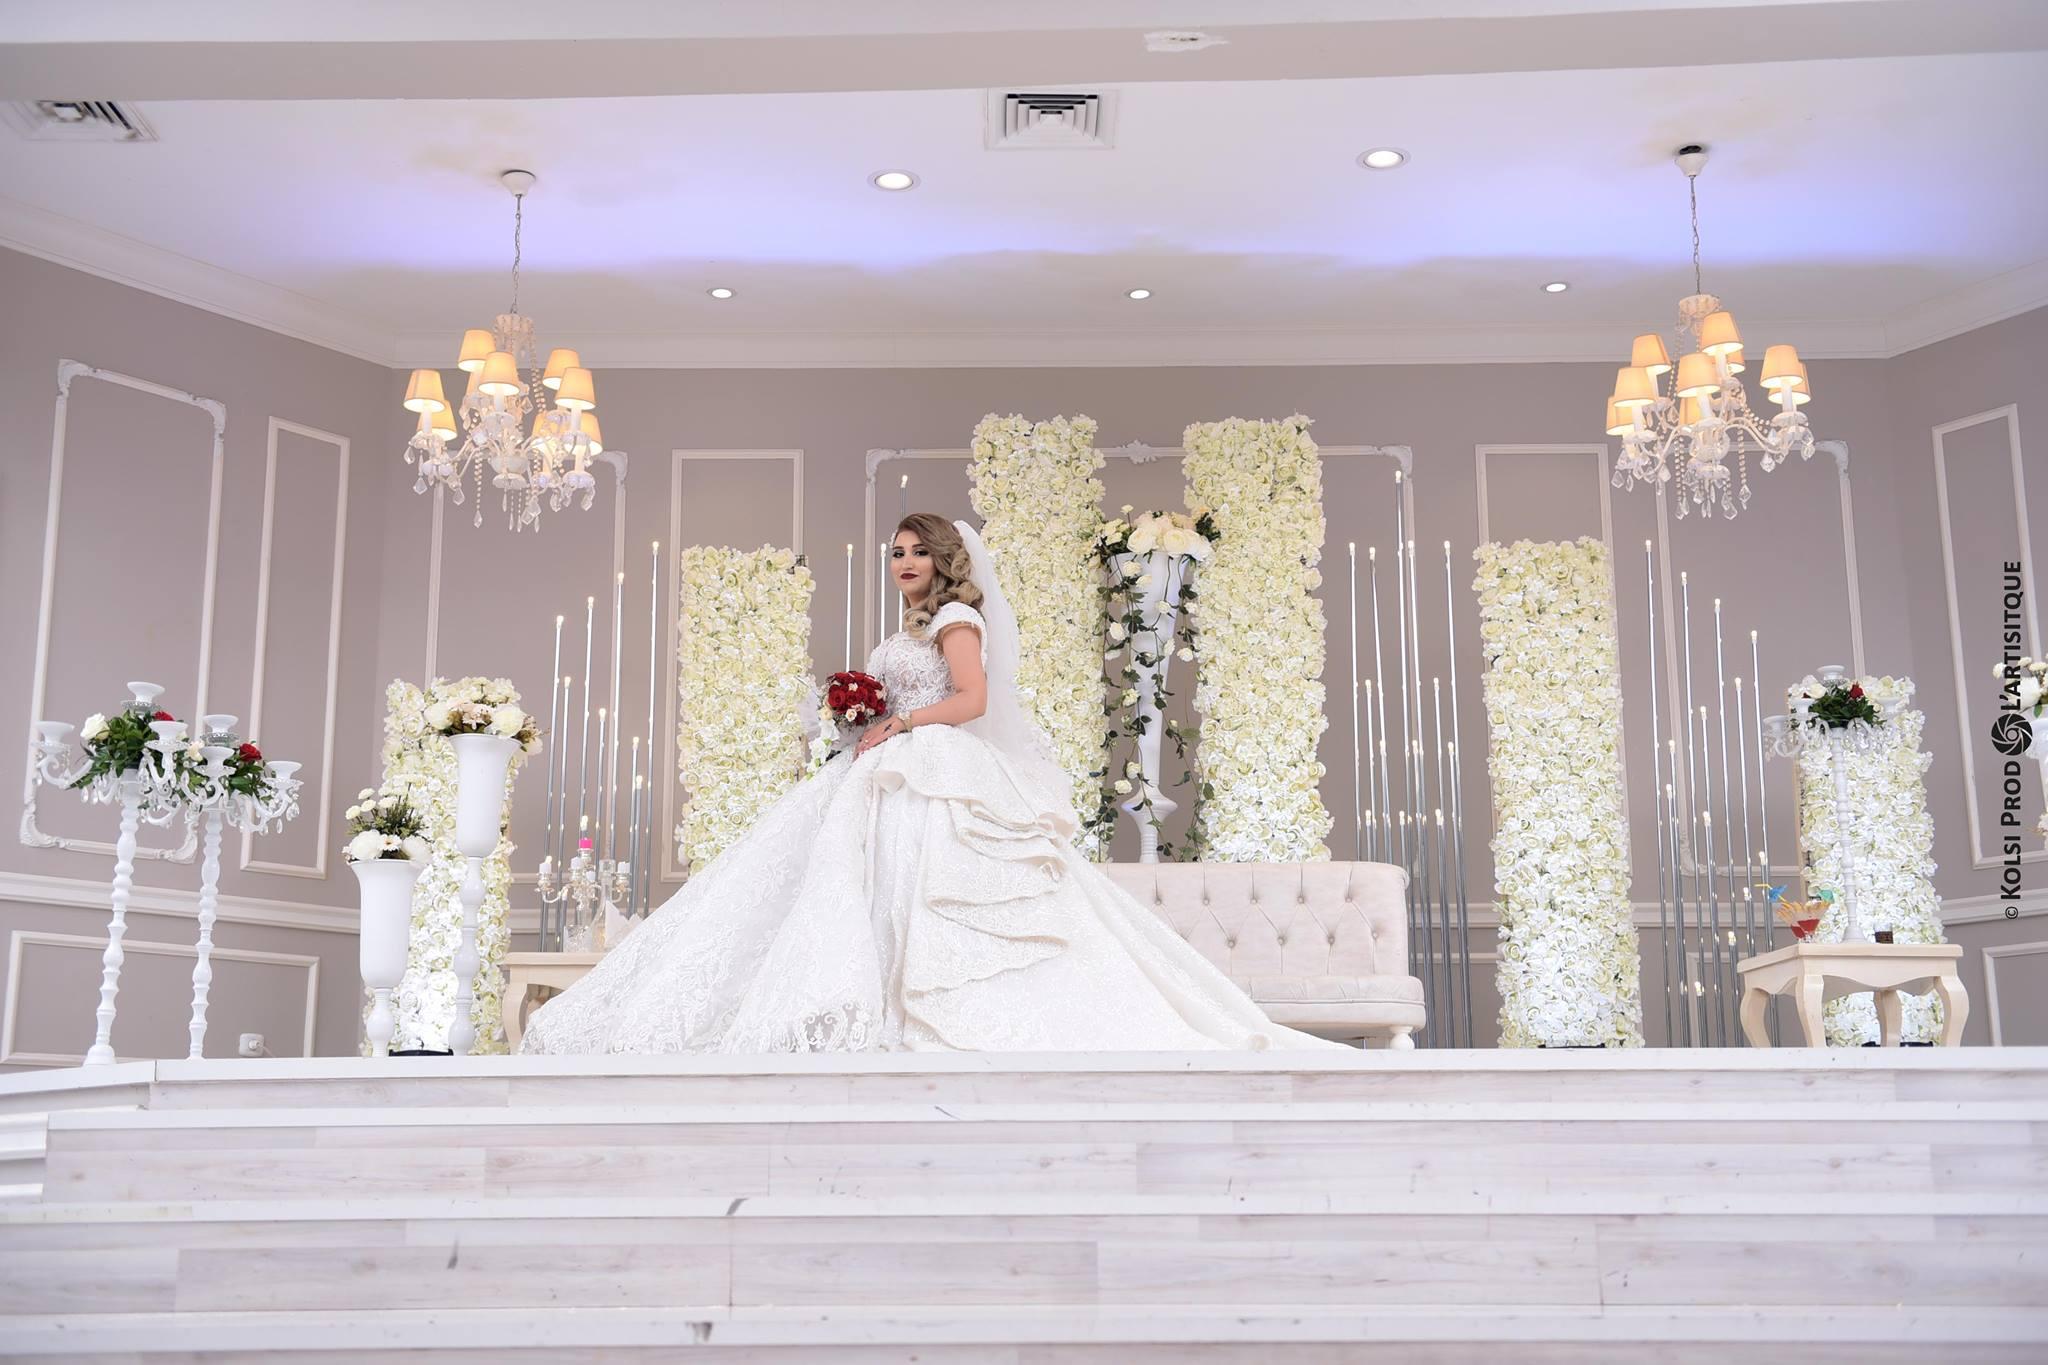 rawai2_plus_belles_mariées_tunisiennes_2019